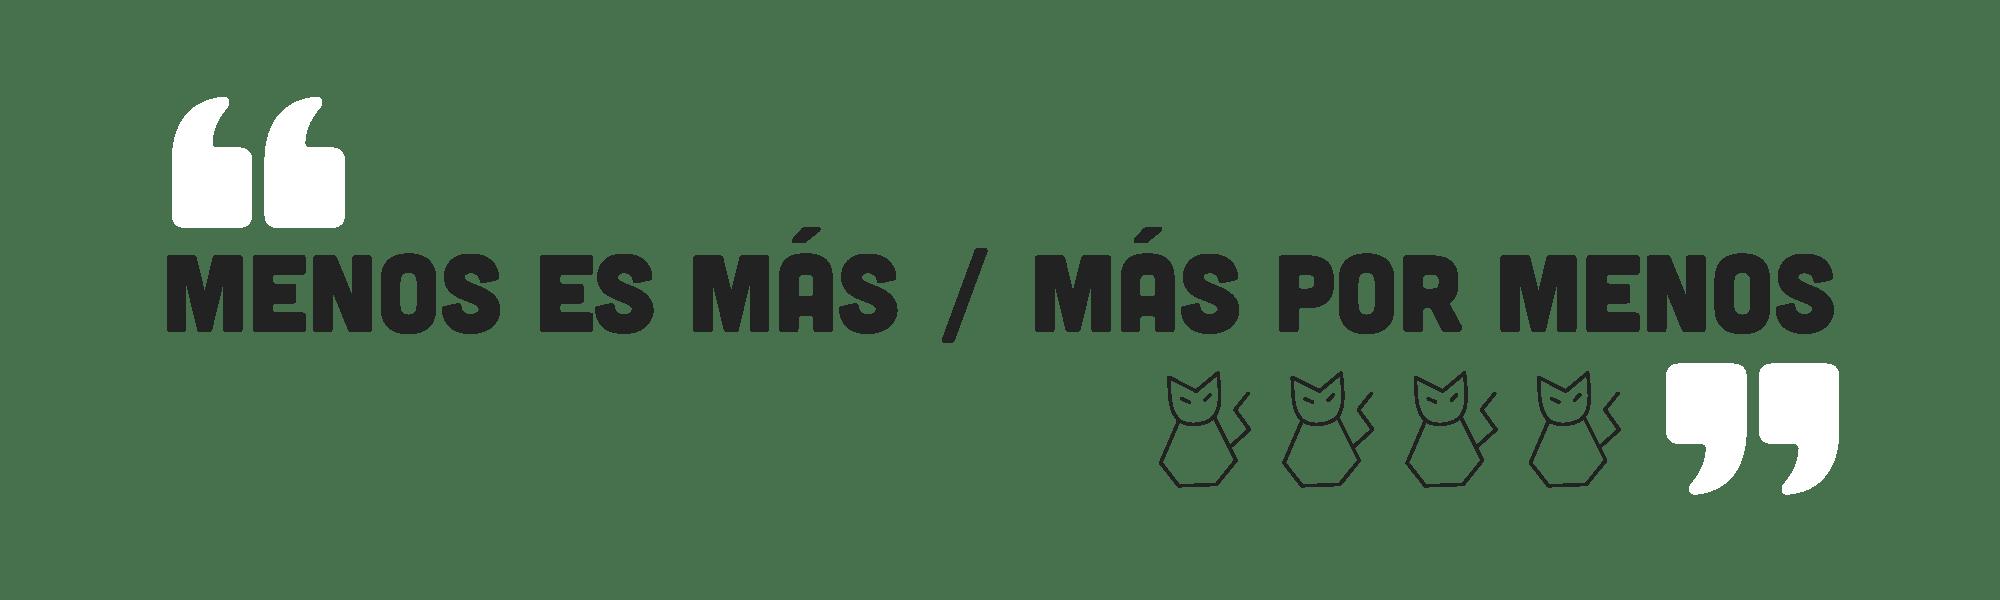 Tarifas_Frase_Cuatro_Gatos_Coworking_Jaen